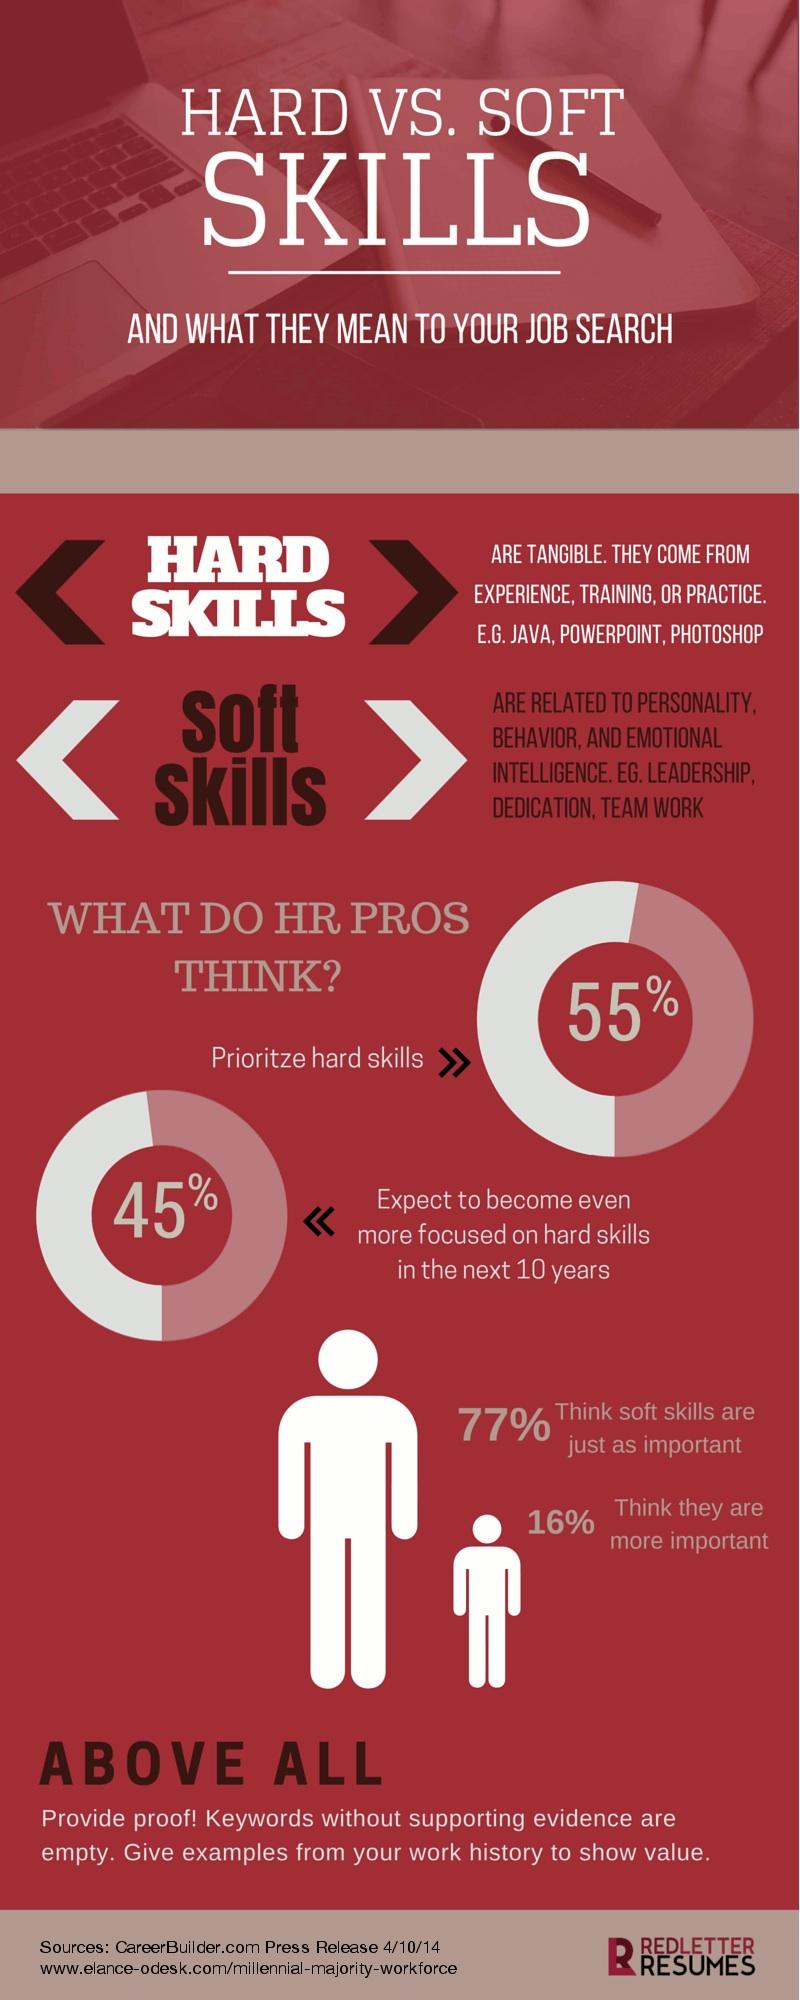 comment evaluer hard skill cv